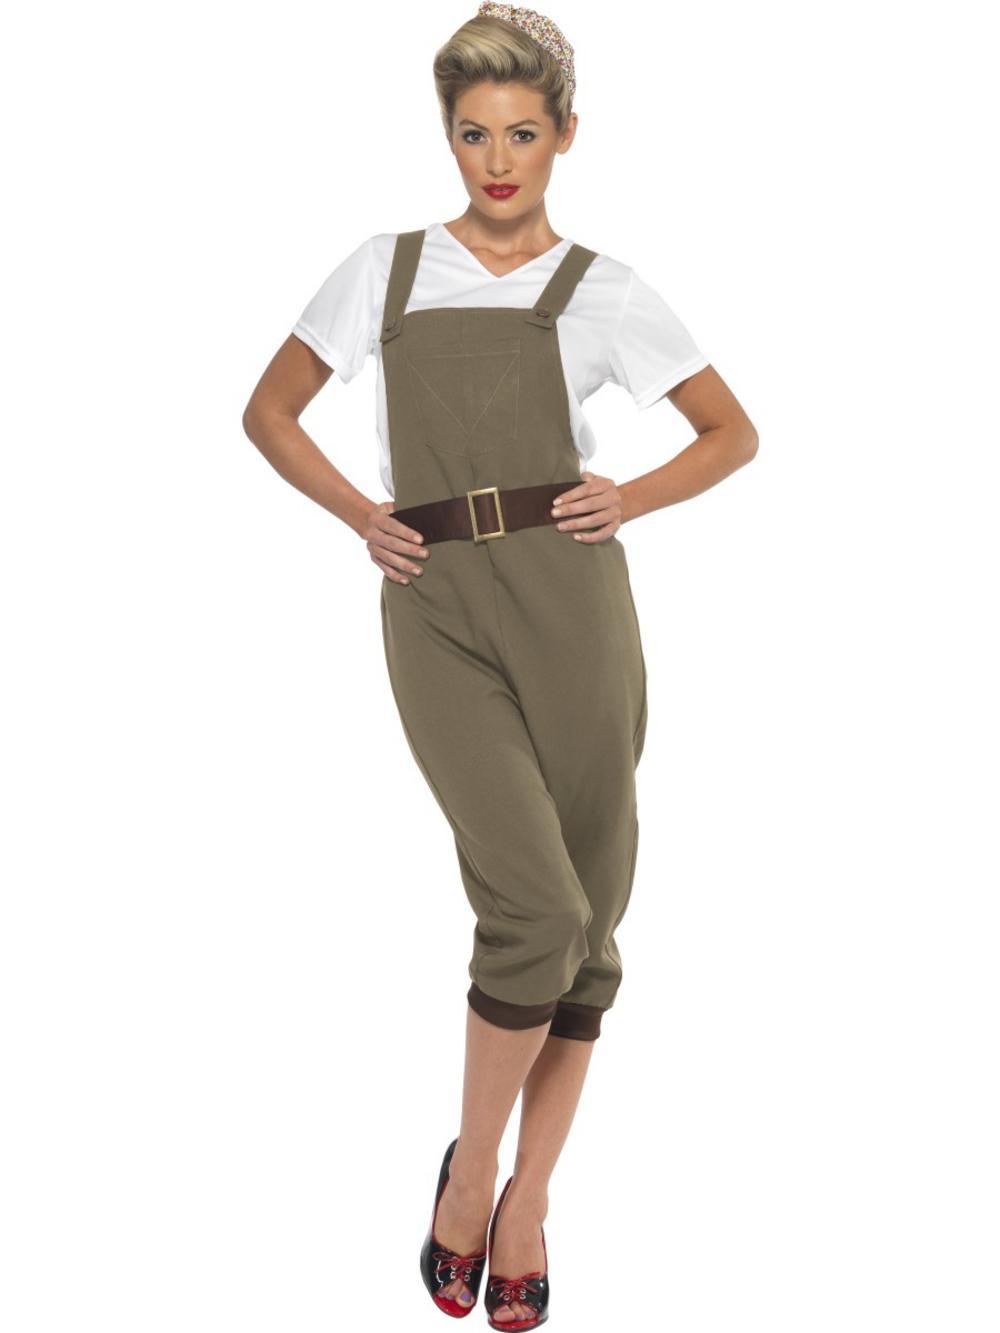 WW2 Land Girl Costume